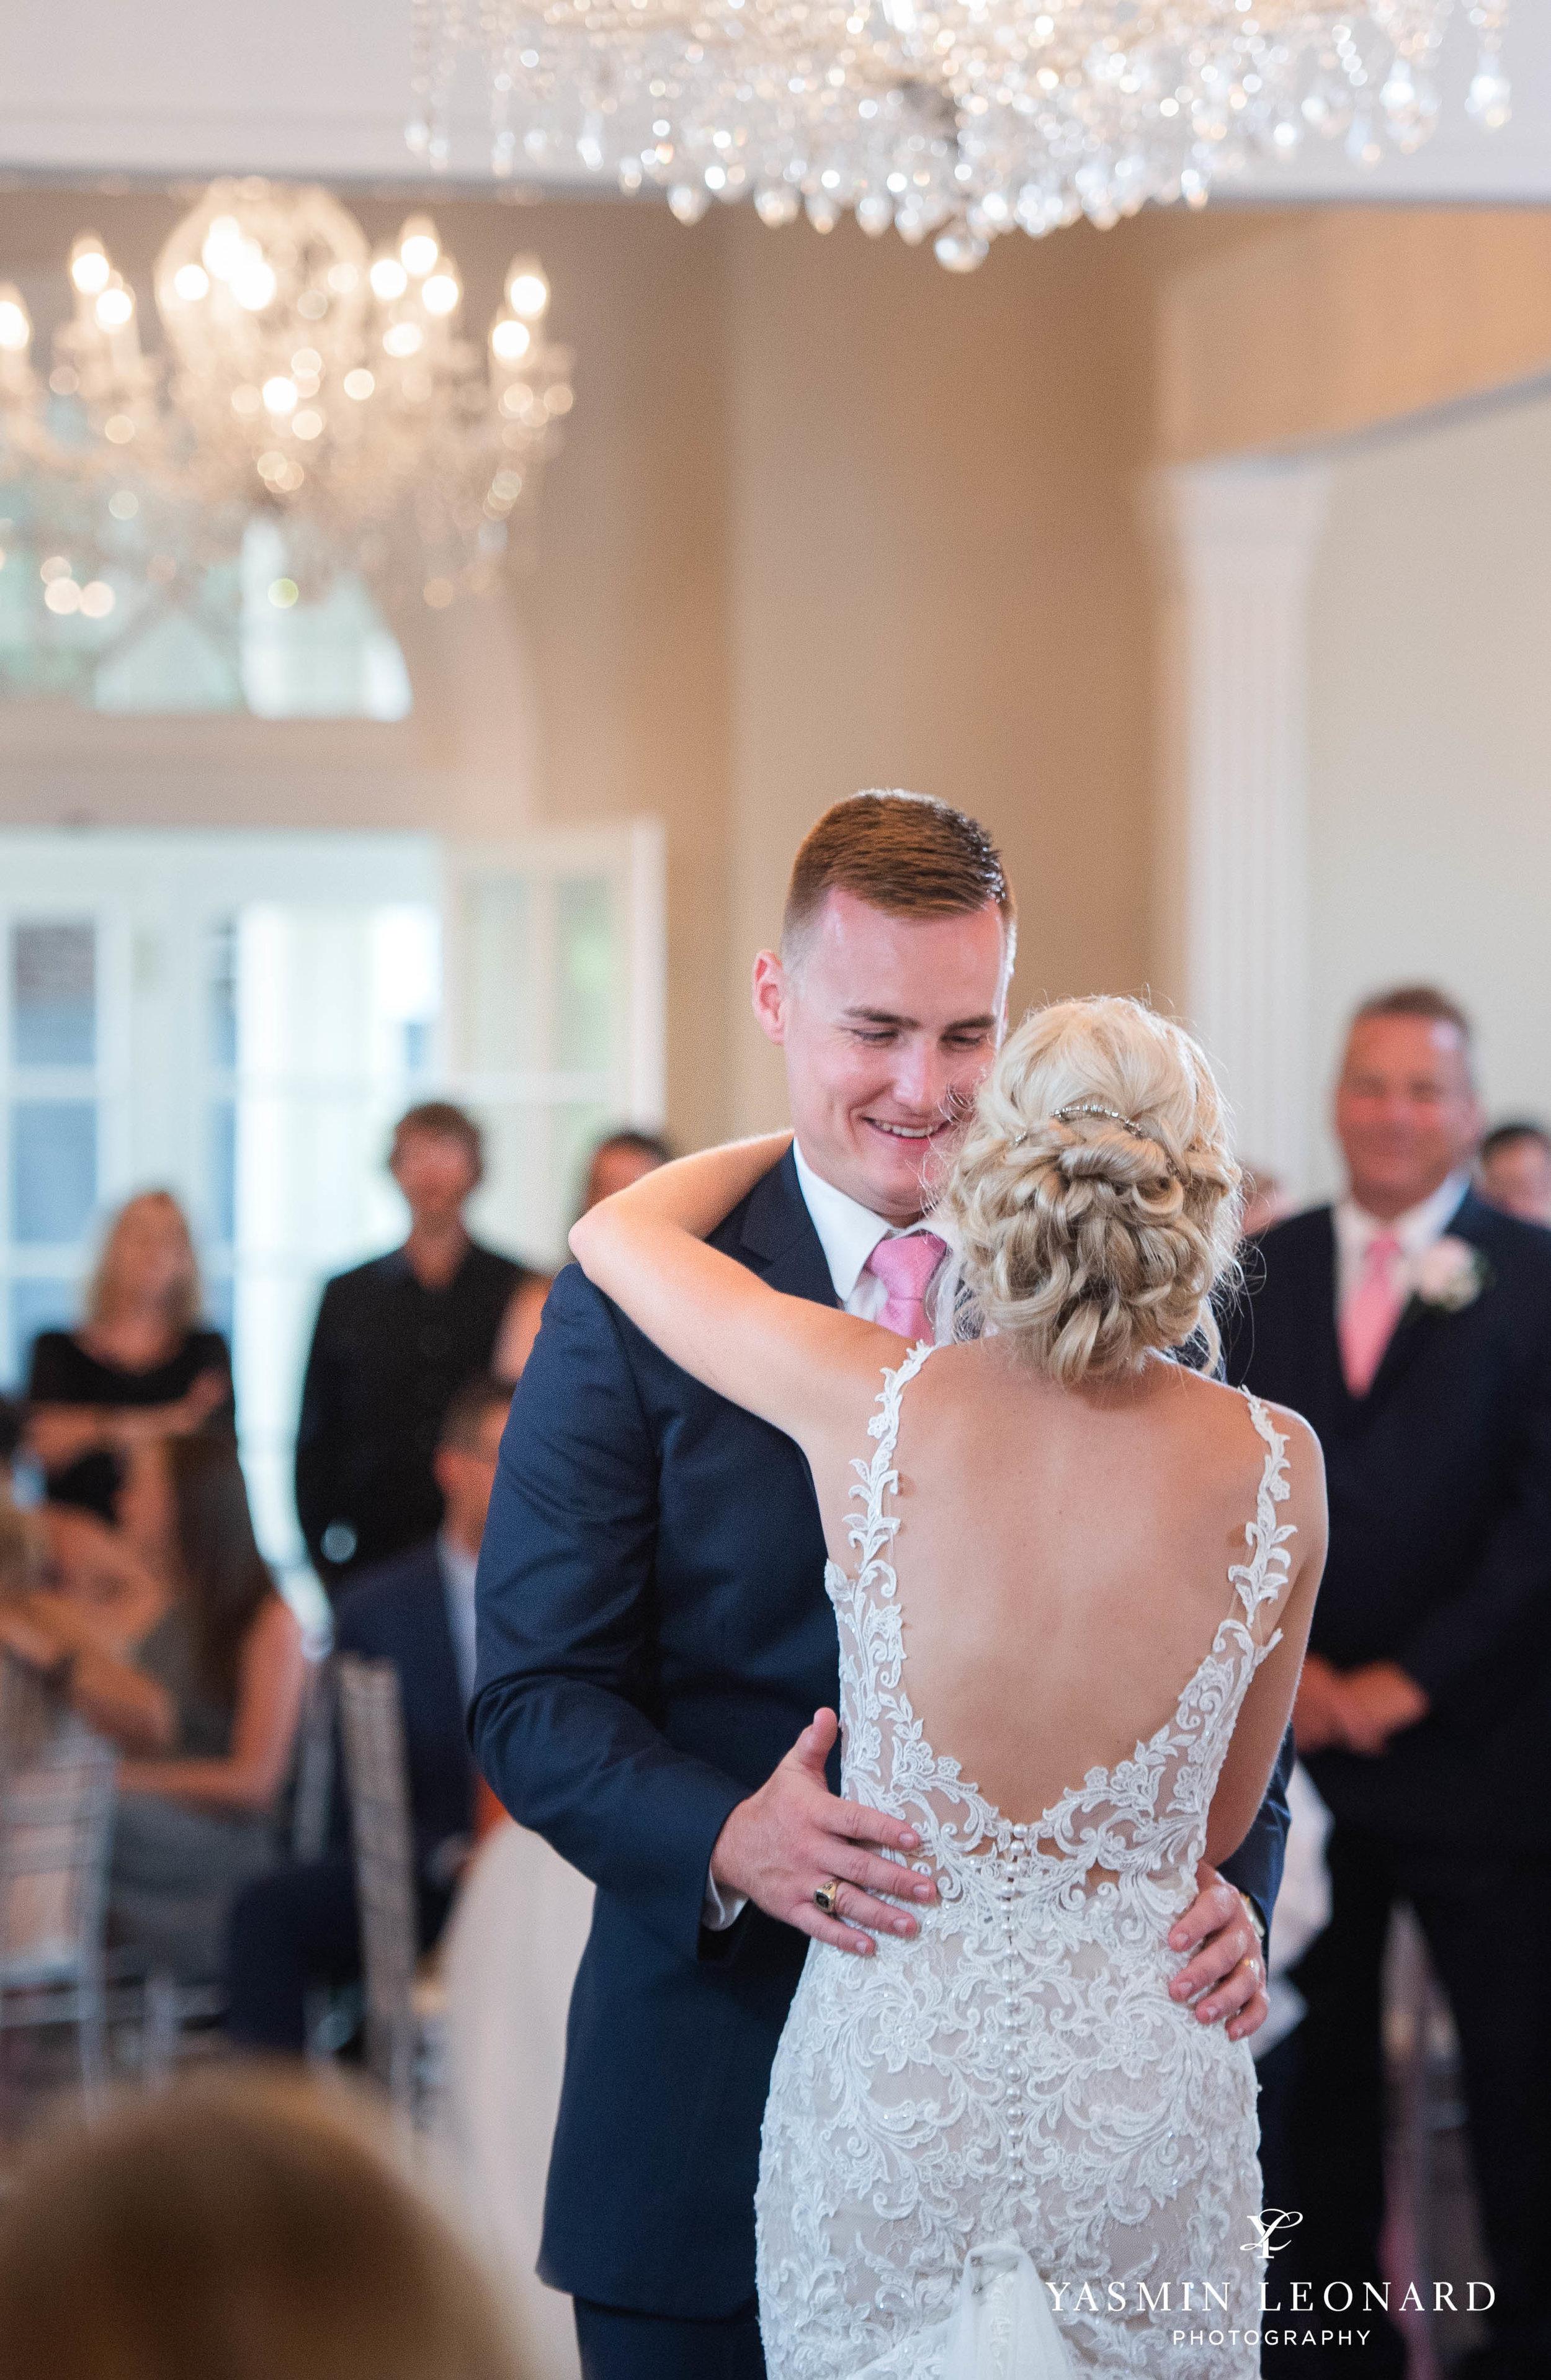 Separk Mansion - NC Weddings - Gastonia Wedding - NC Wedding Venues - Pink and Blue Wedding Ideas - Pink Bridesmaid Dresses - Yasmin Leonard Photography-47.jpg